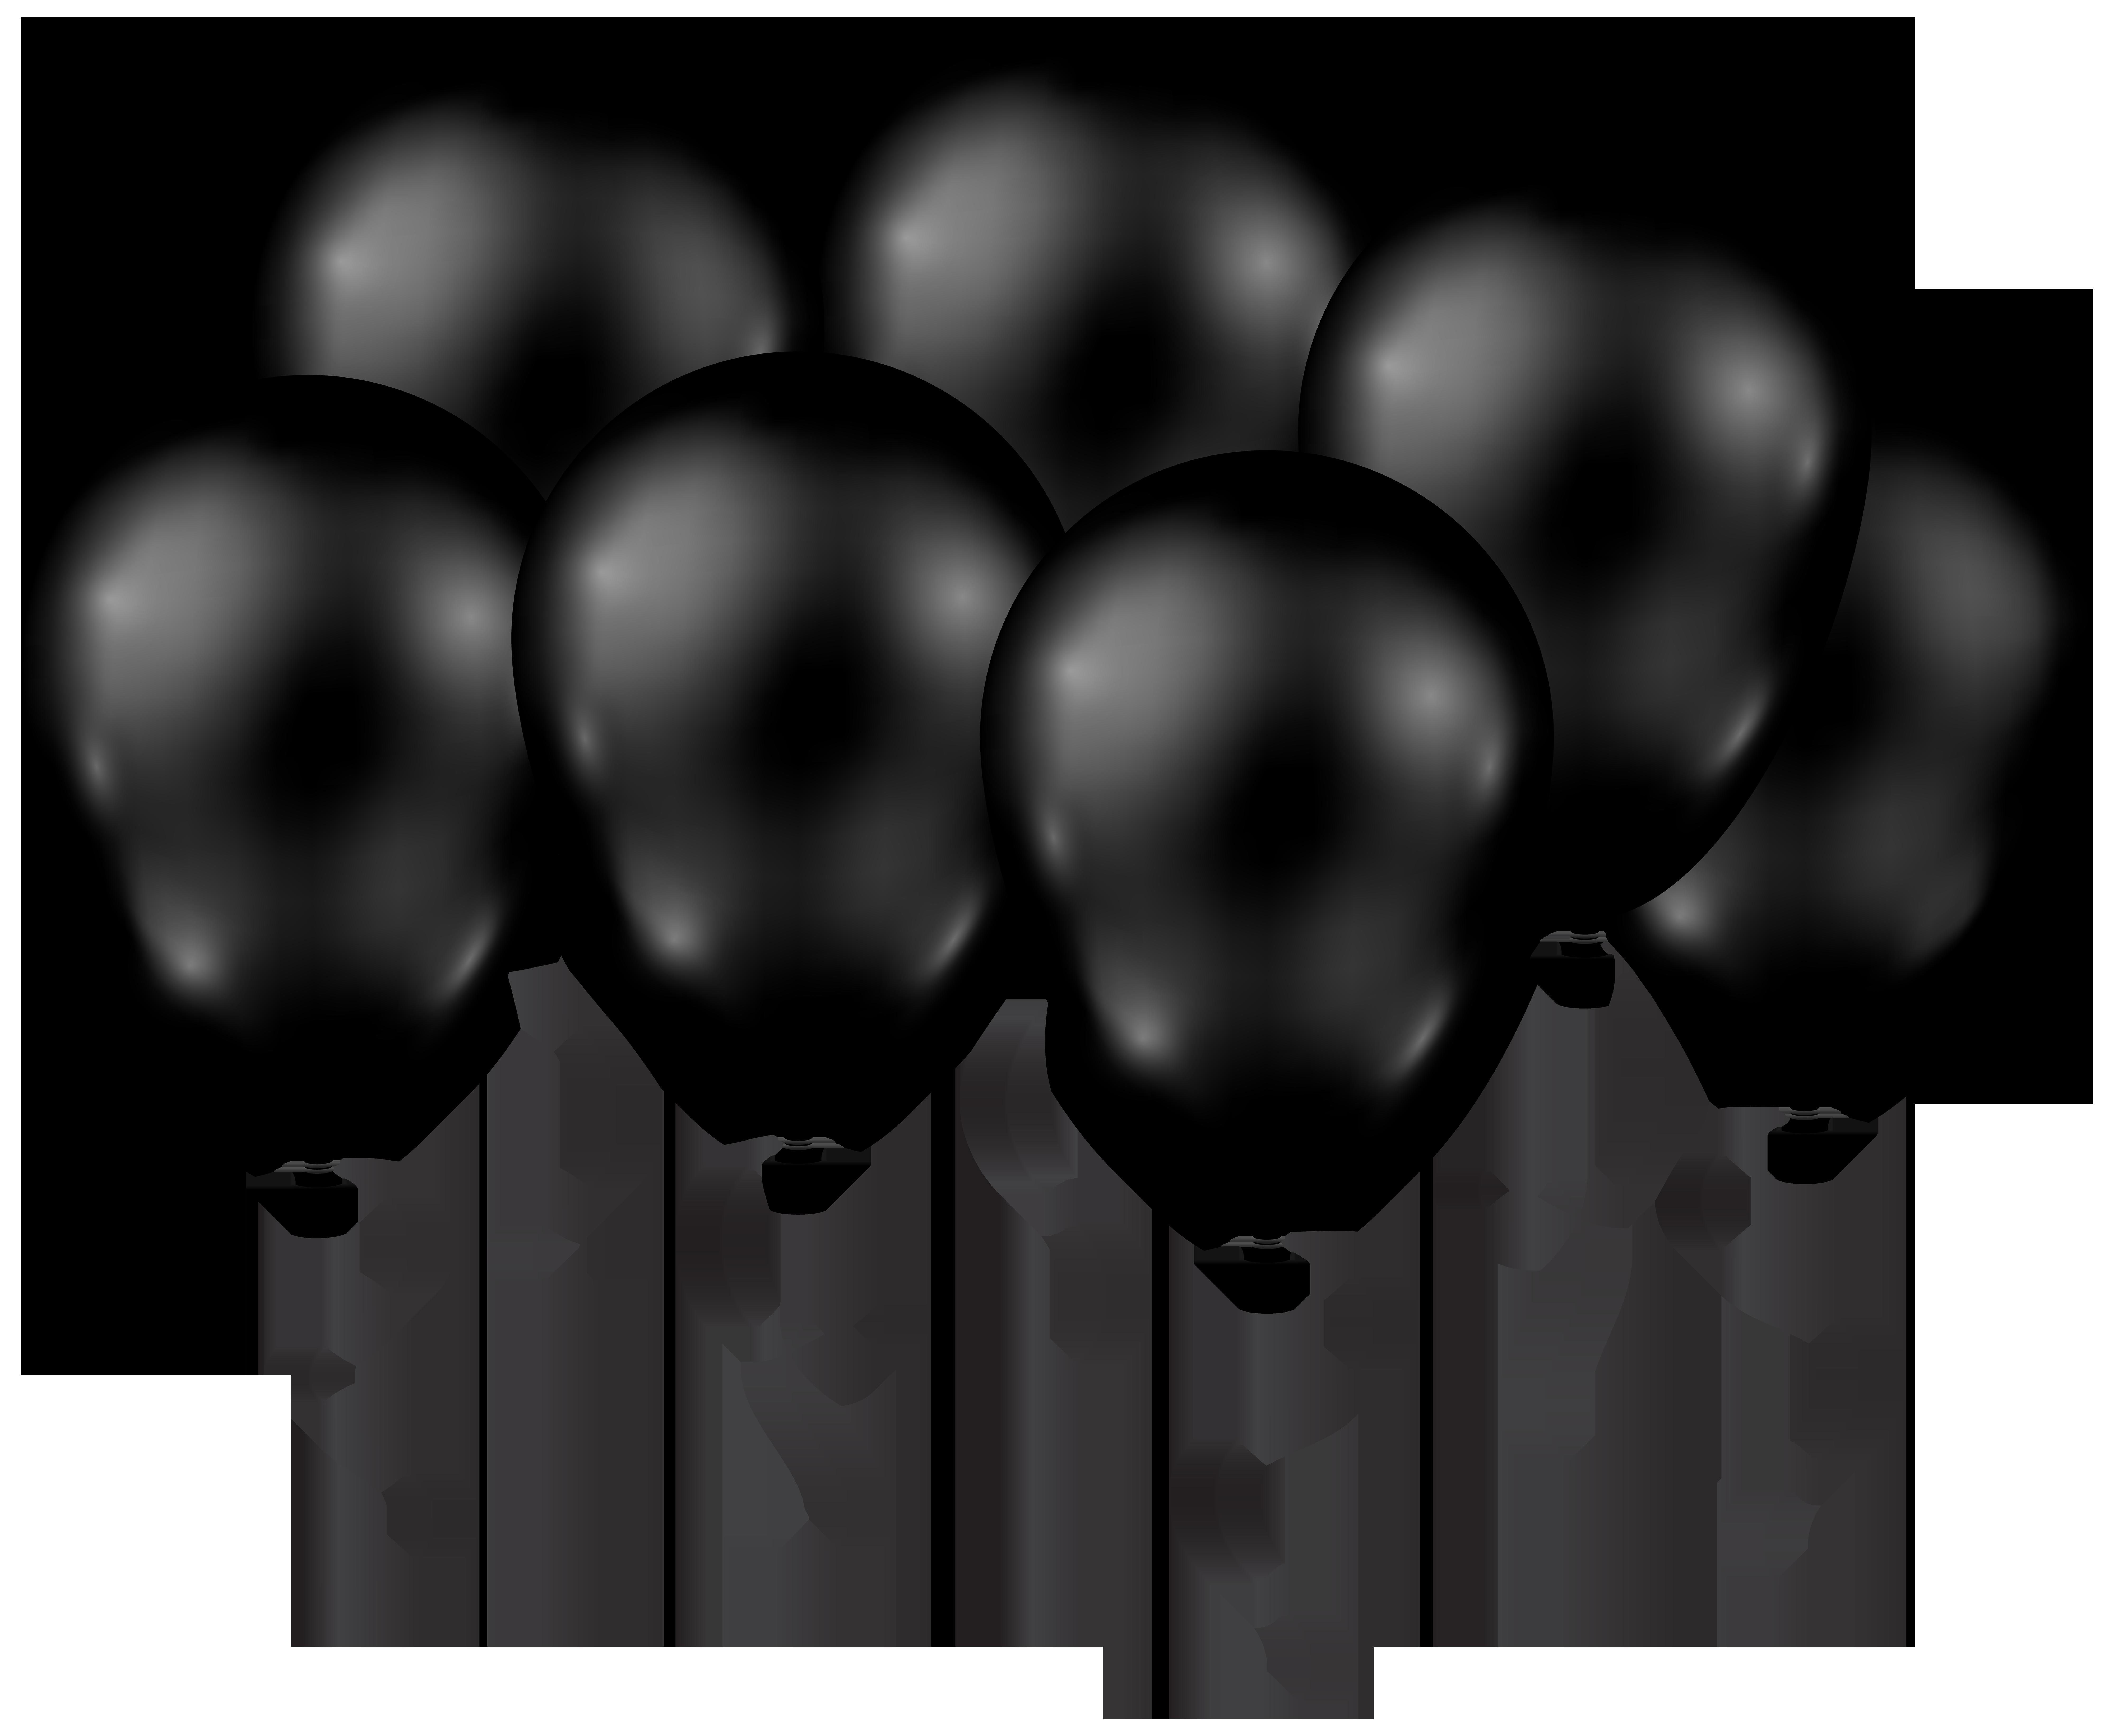 Facebook clipart monochrome. Black balloons transparent png